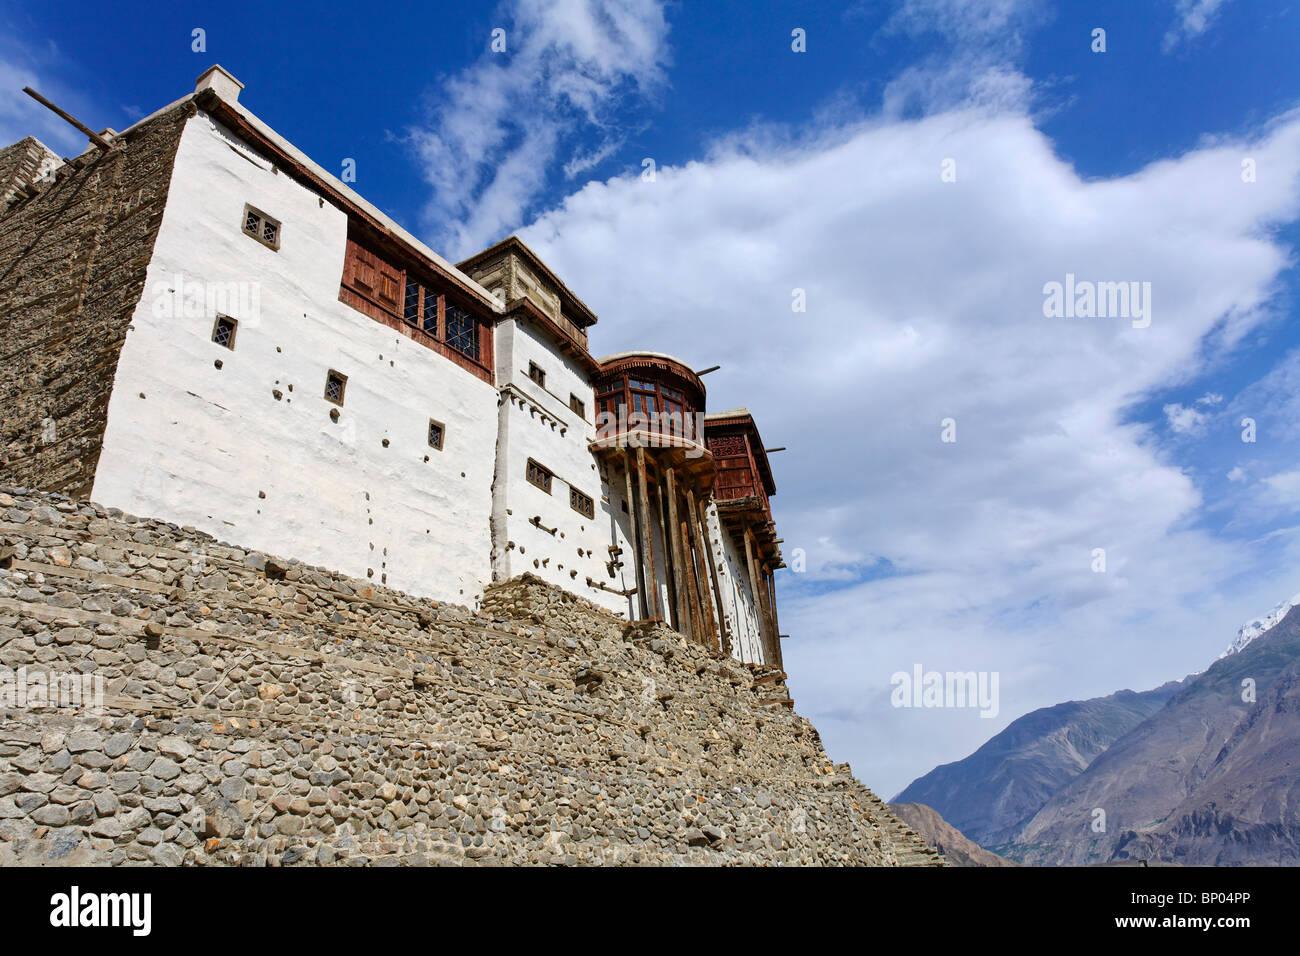 Pakistan - Hunza Valley - Karimabad - Baltit Fort - Stock Image